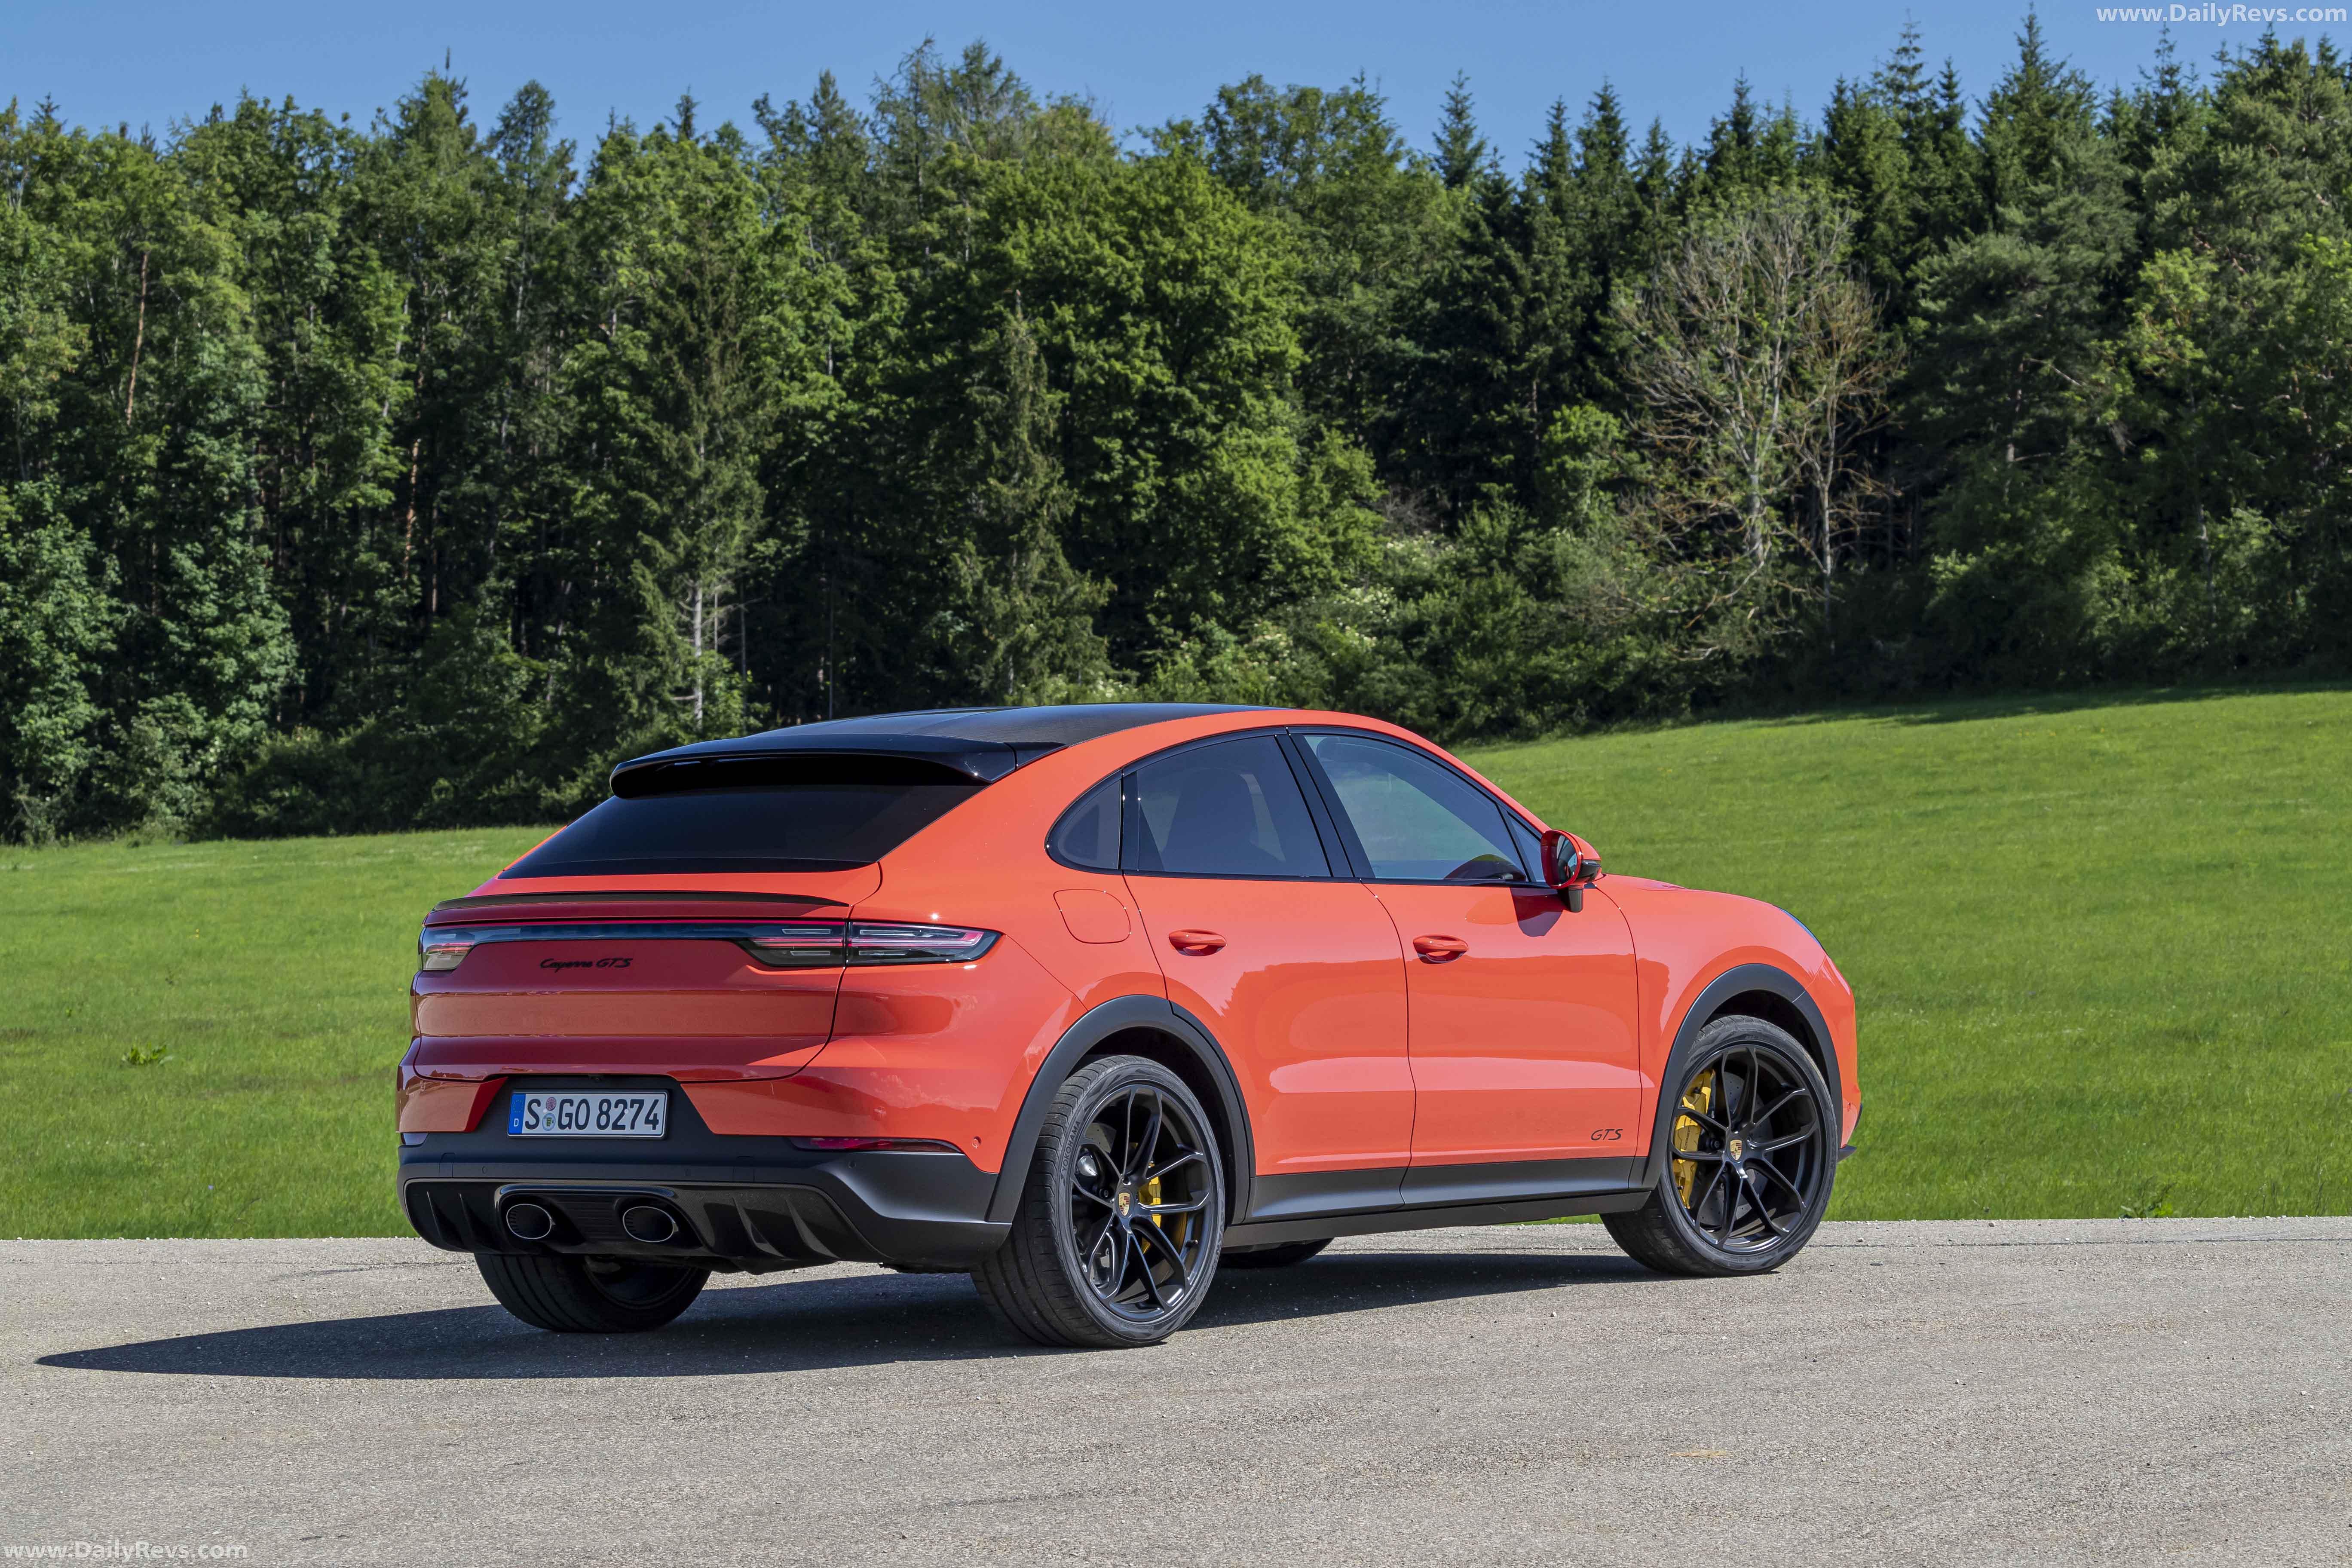 2020 Porsche Cayenne GTS Coupe Lava Orange - Dailyrevs